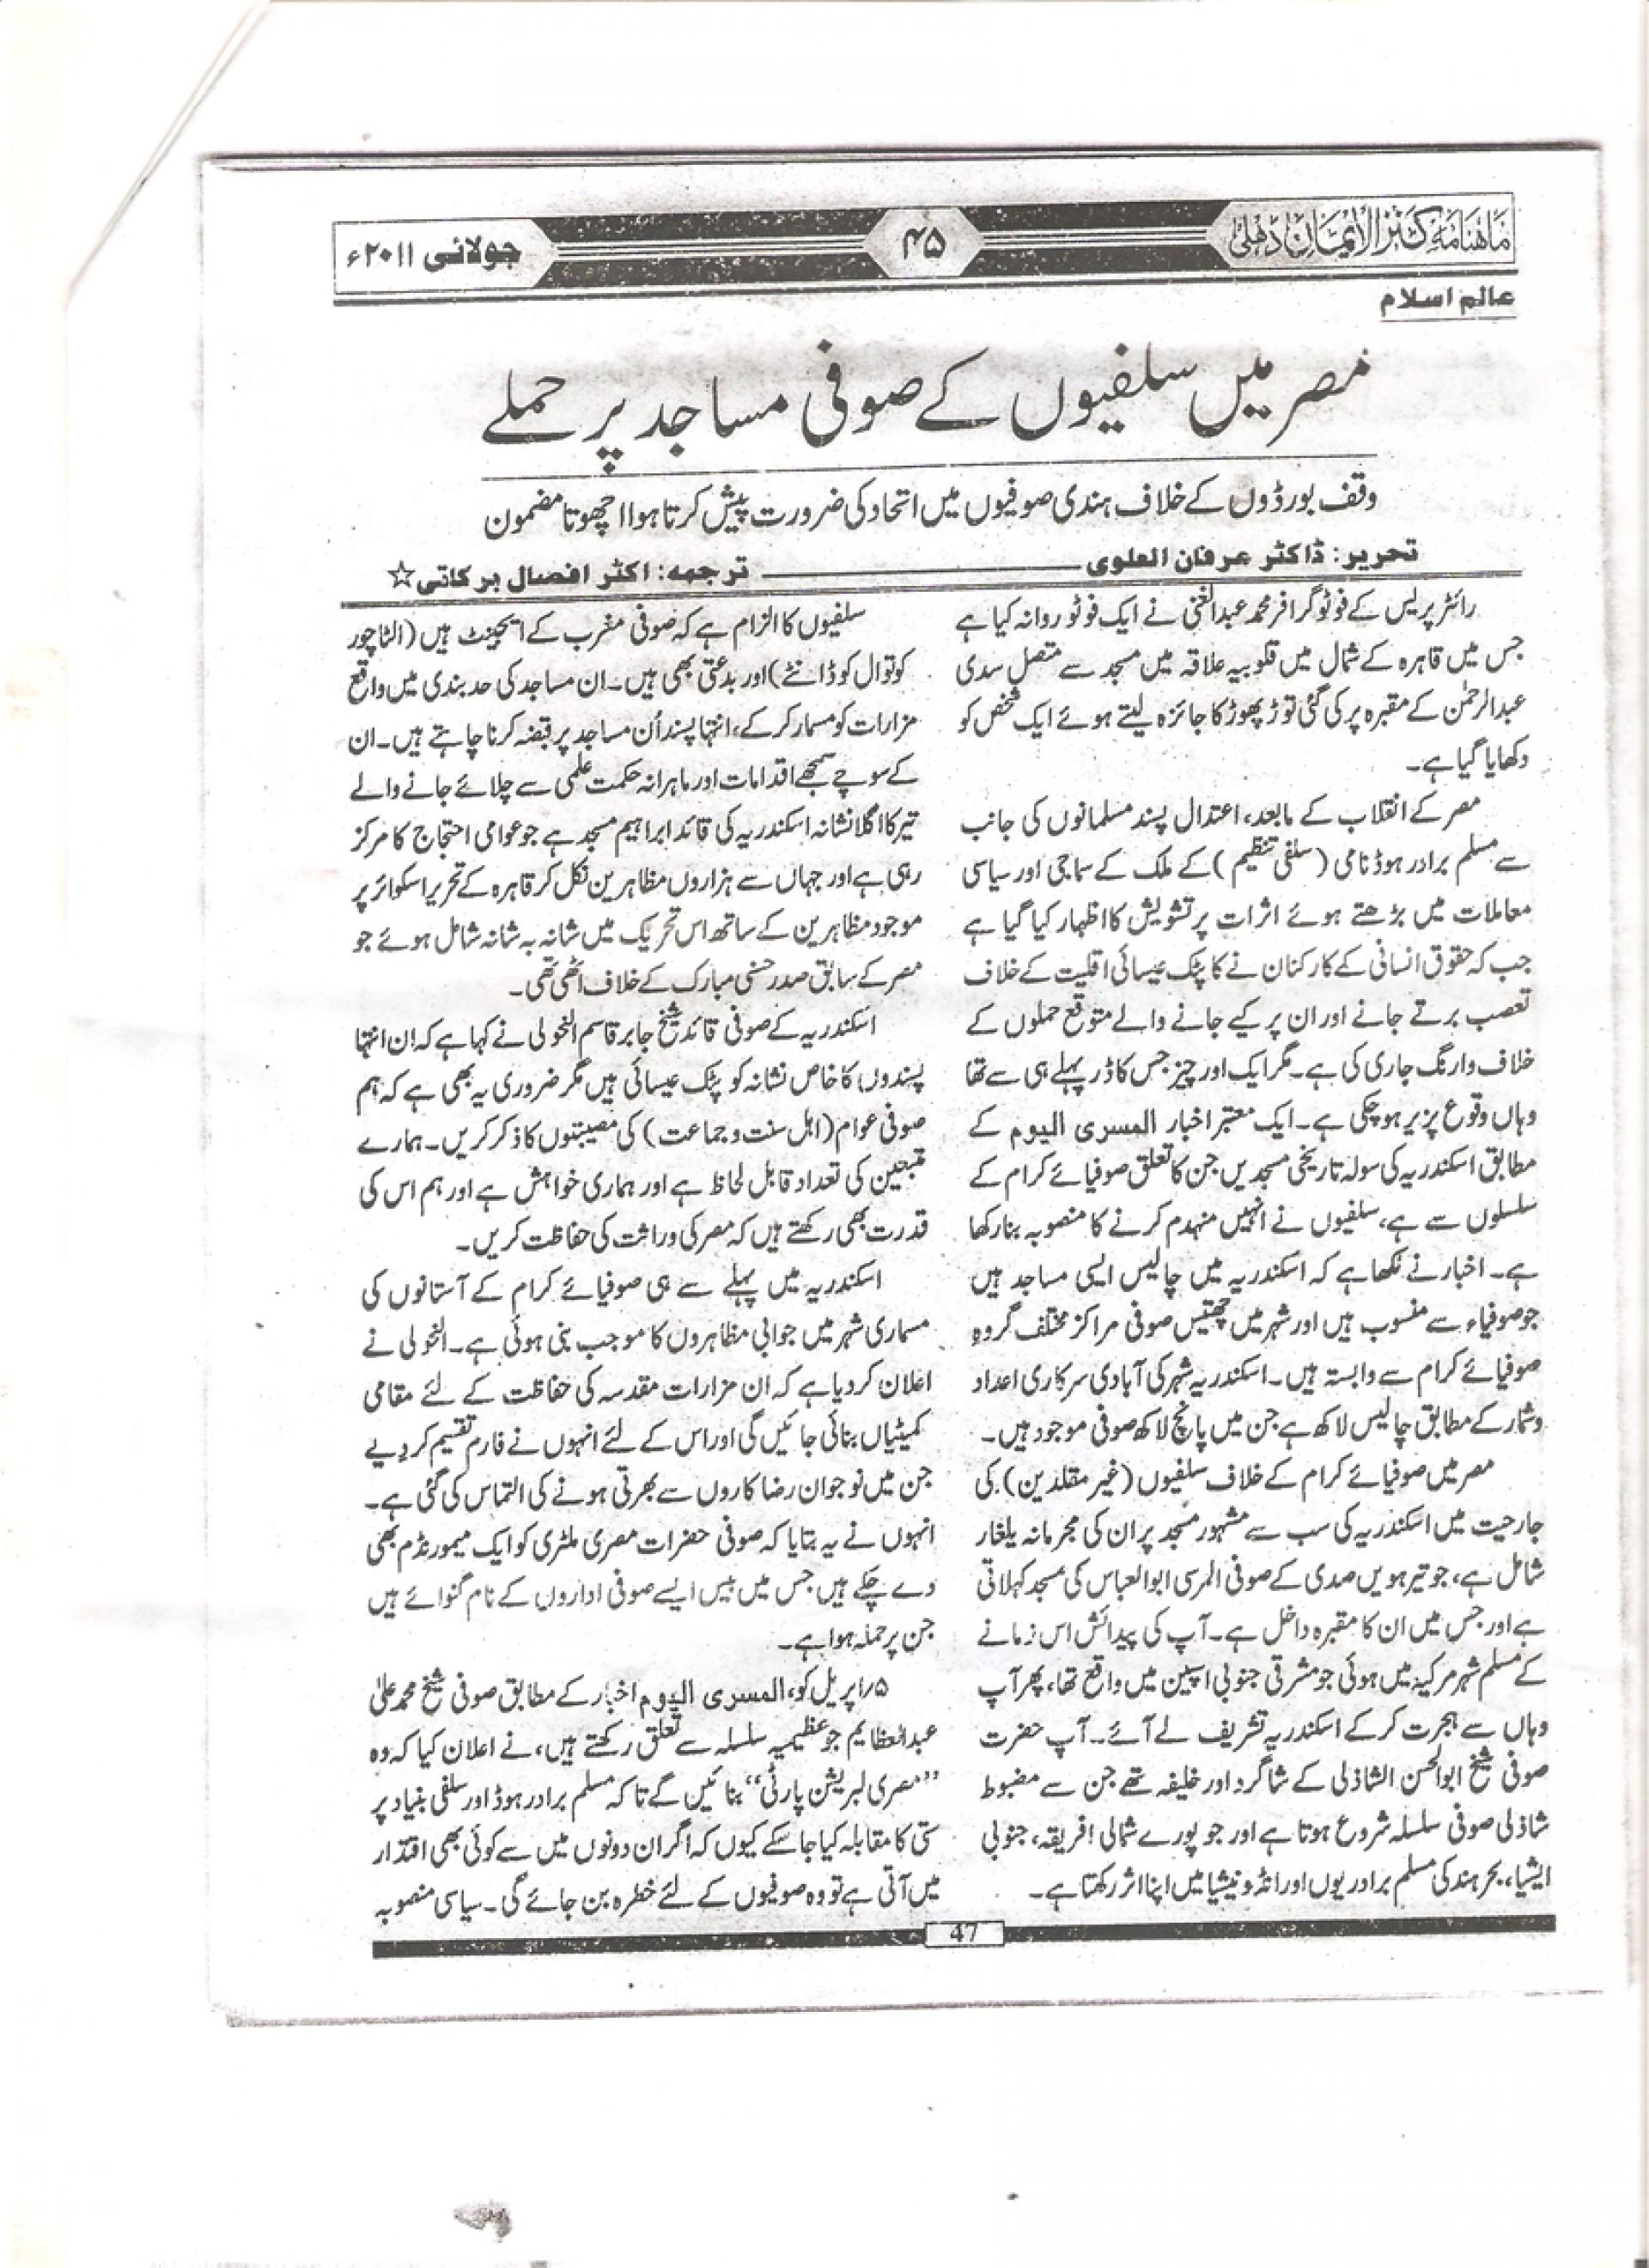 011 Sufi Essays Essay Singular Seyyed Hossein Nasr Pdf 1920